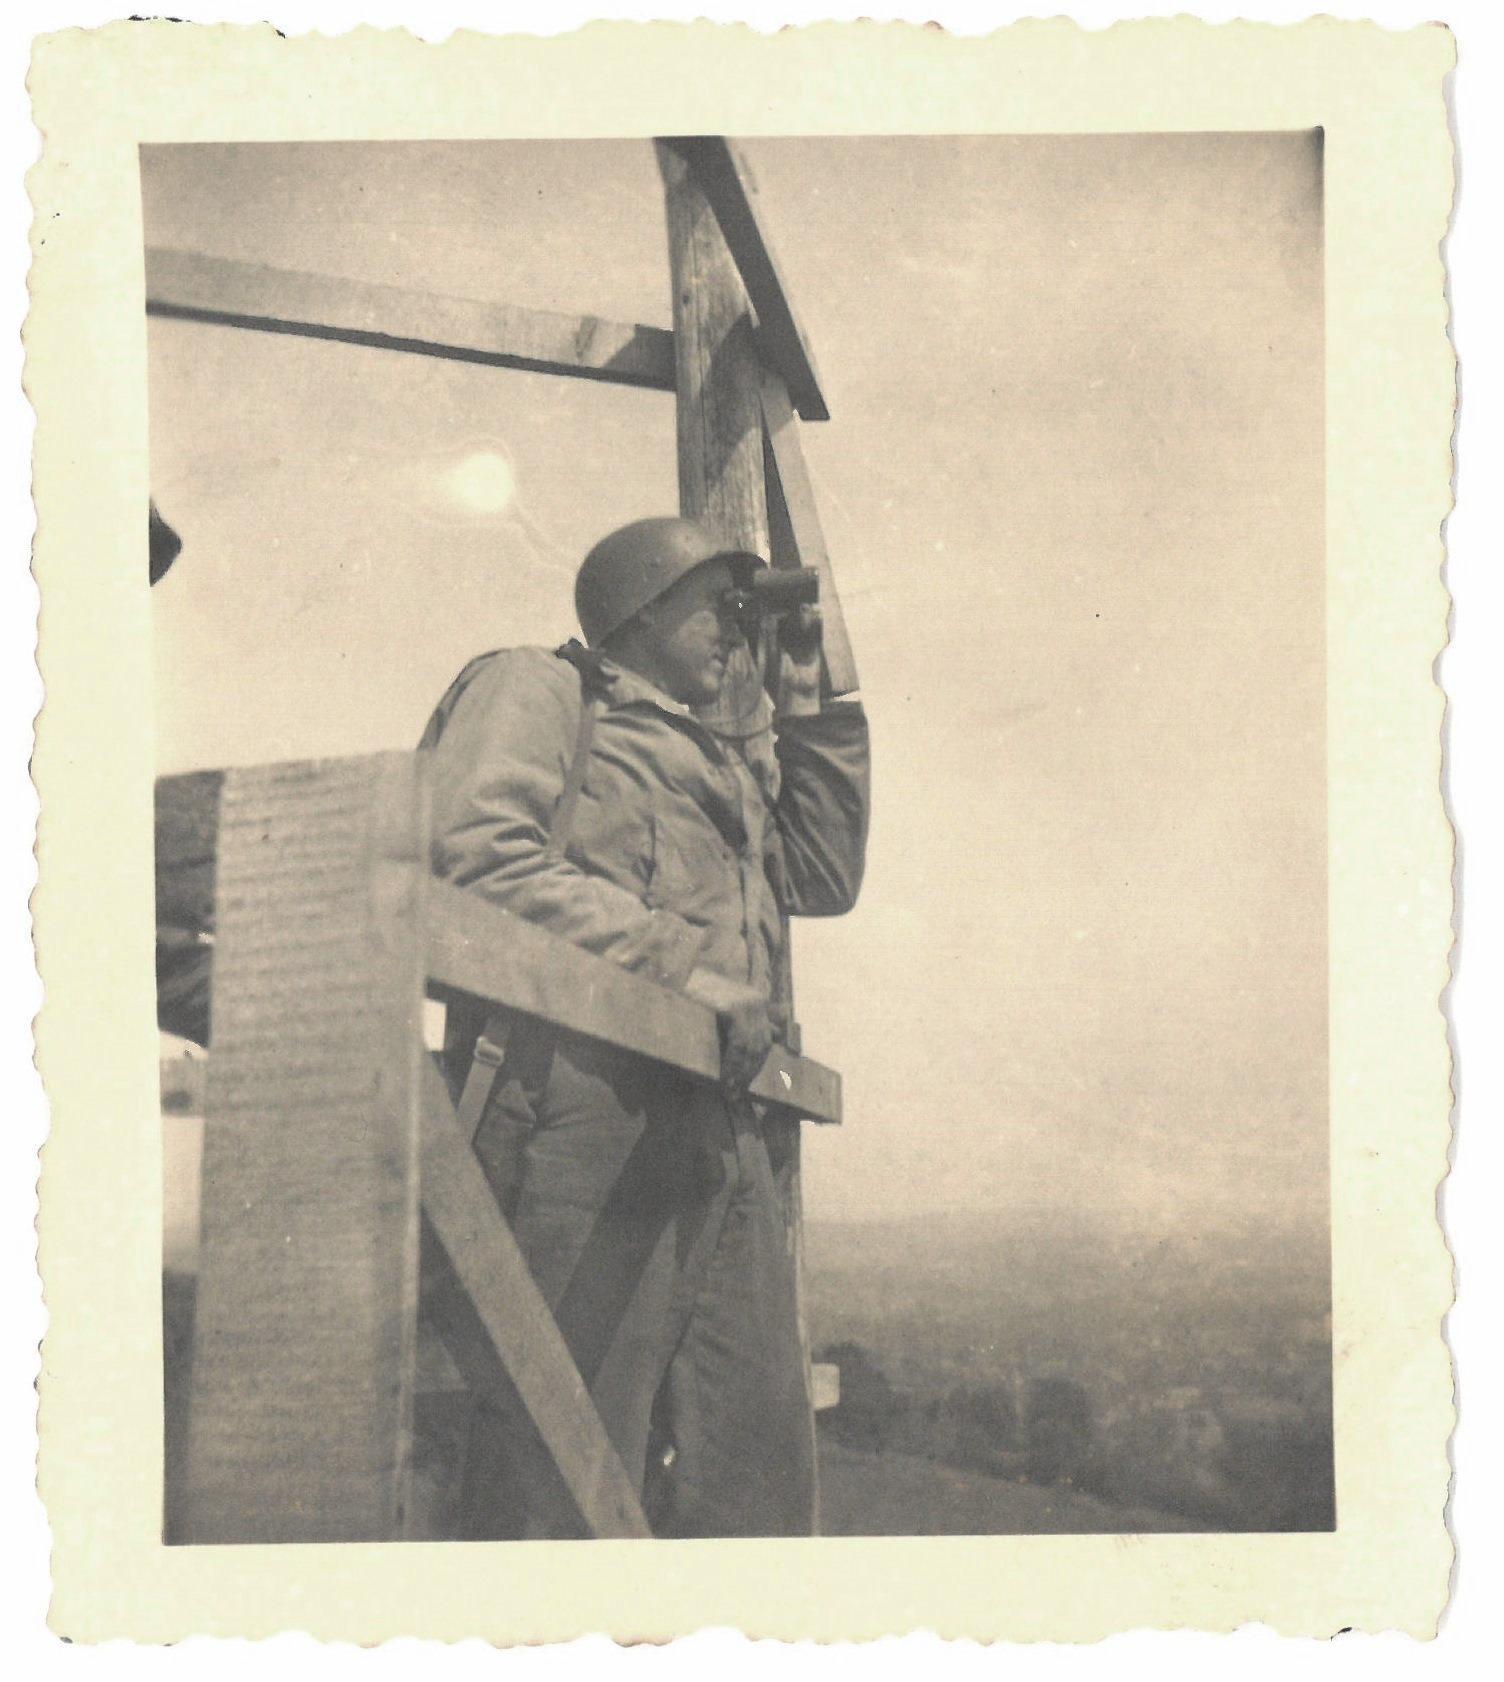 'Triangulation station near Flash O.P. St Sev. Cal.' Normandy 1944